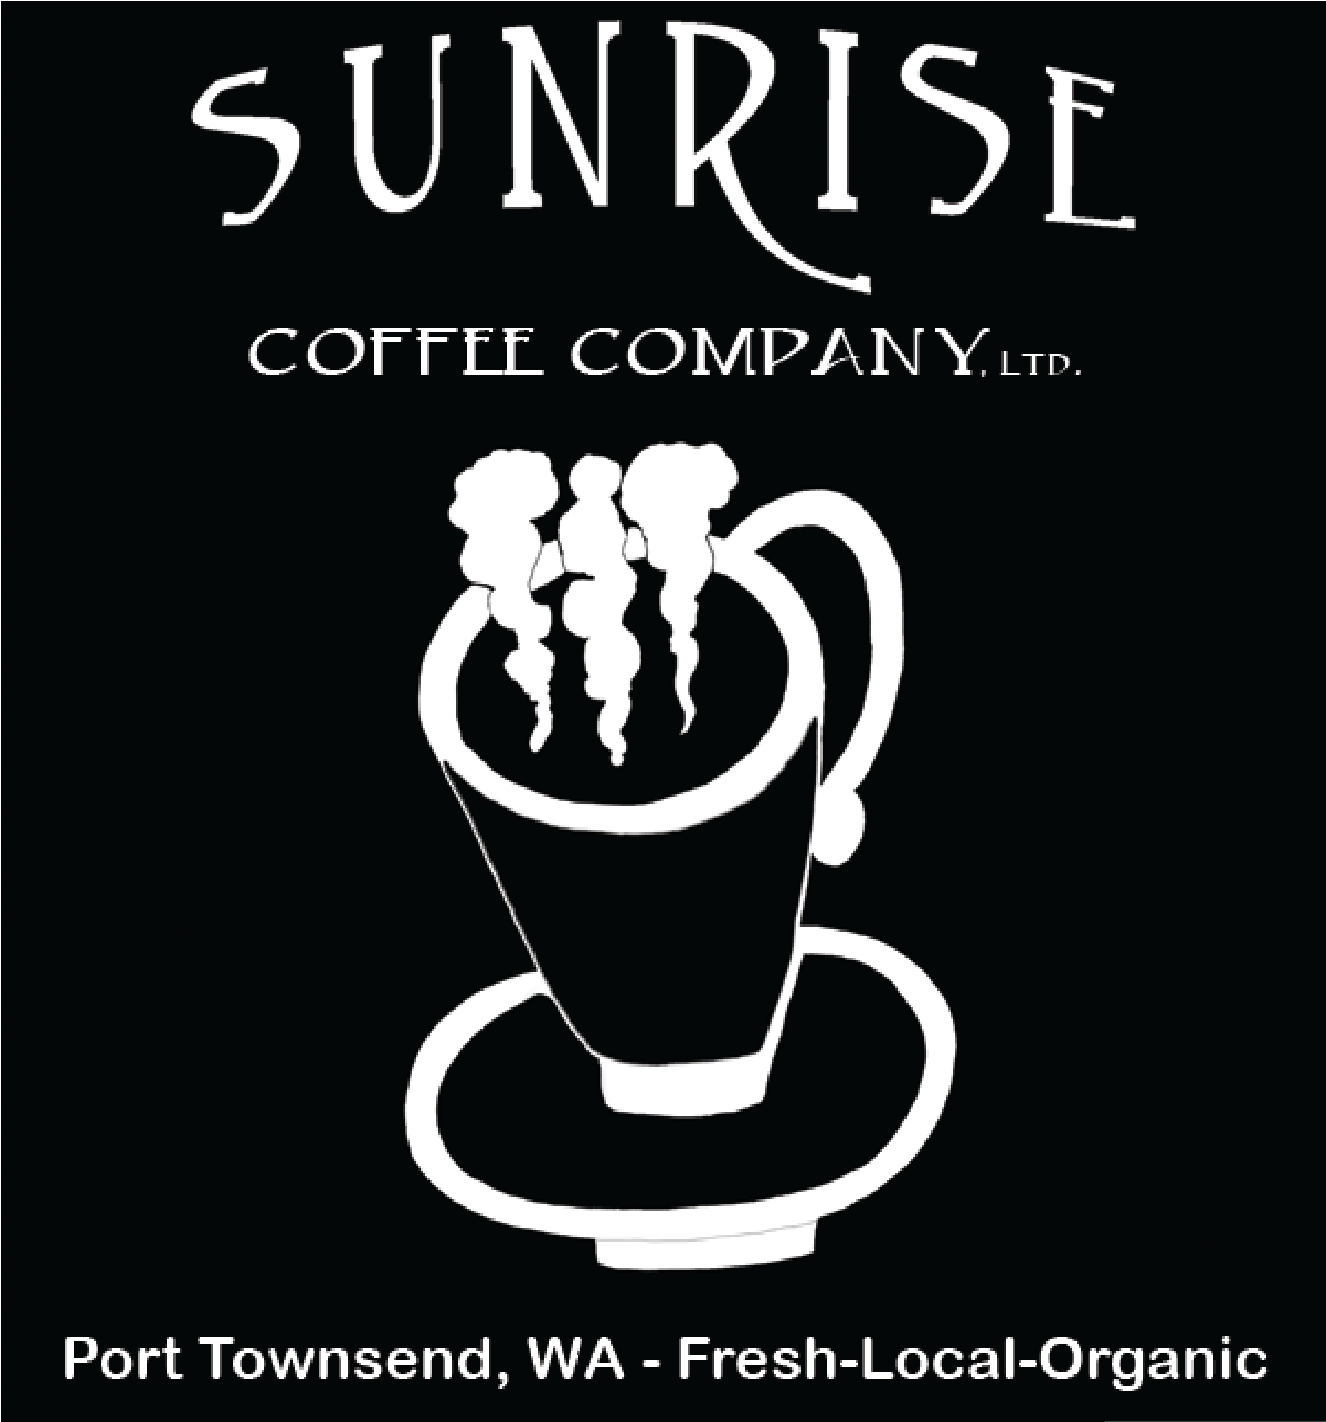 SunriseLogoCupB&W2x2-1.png